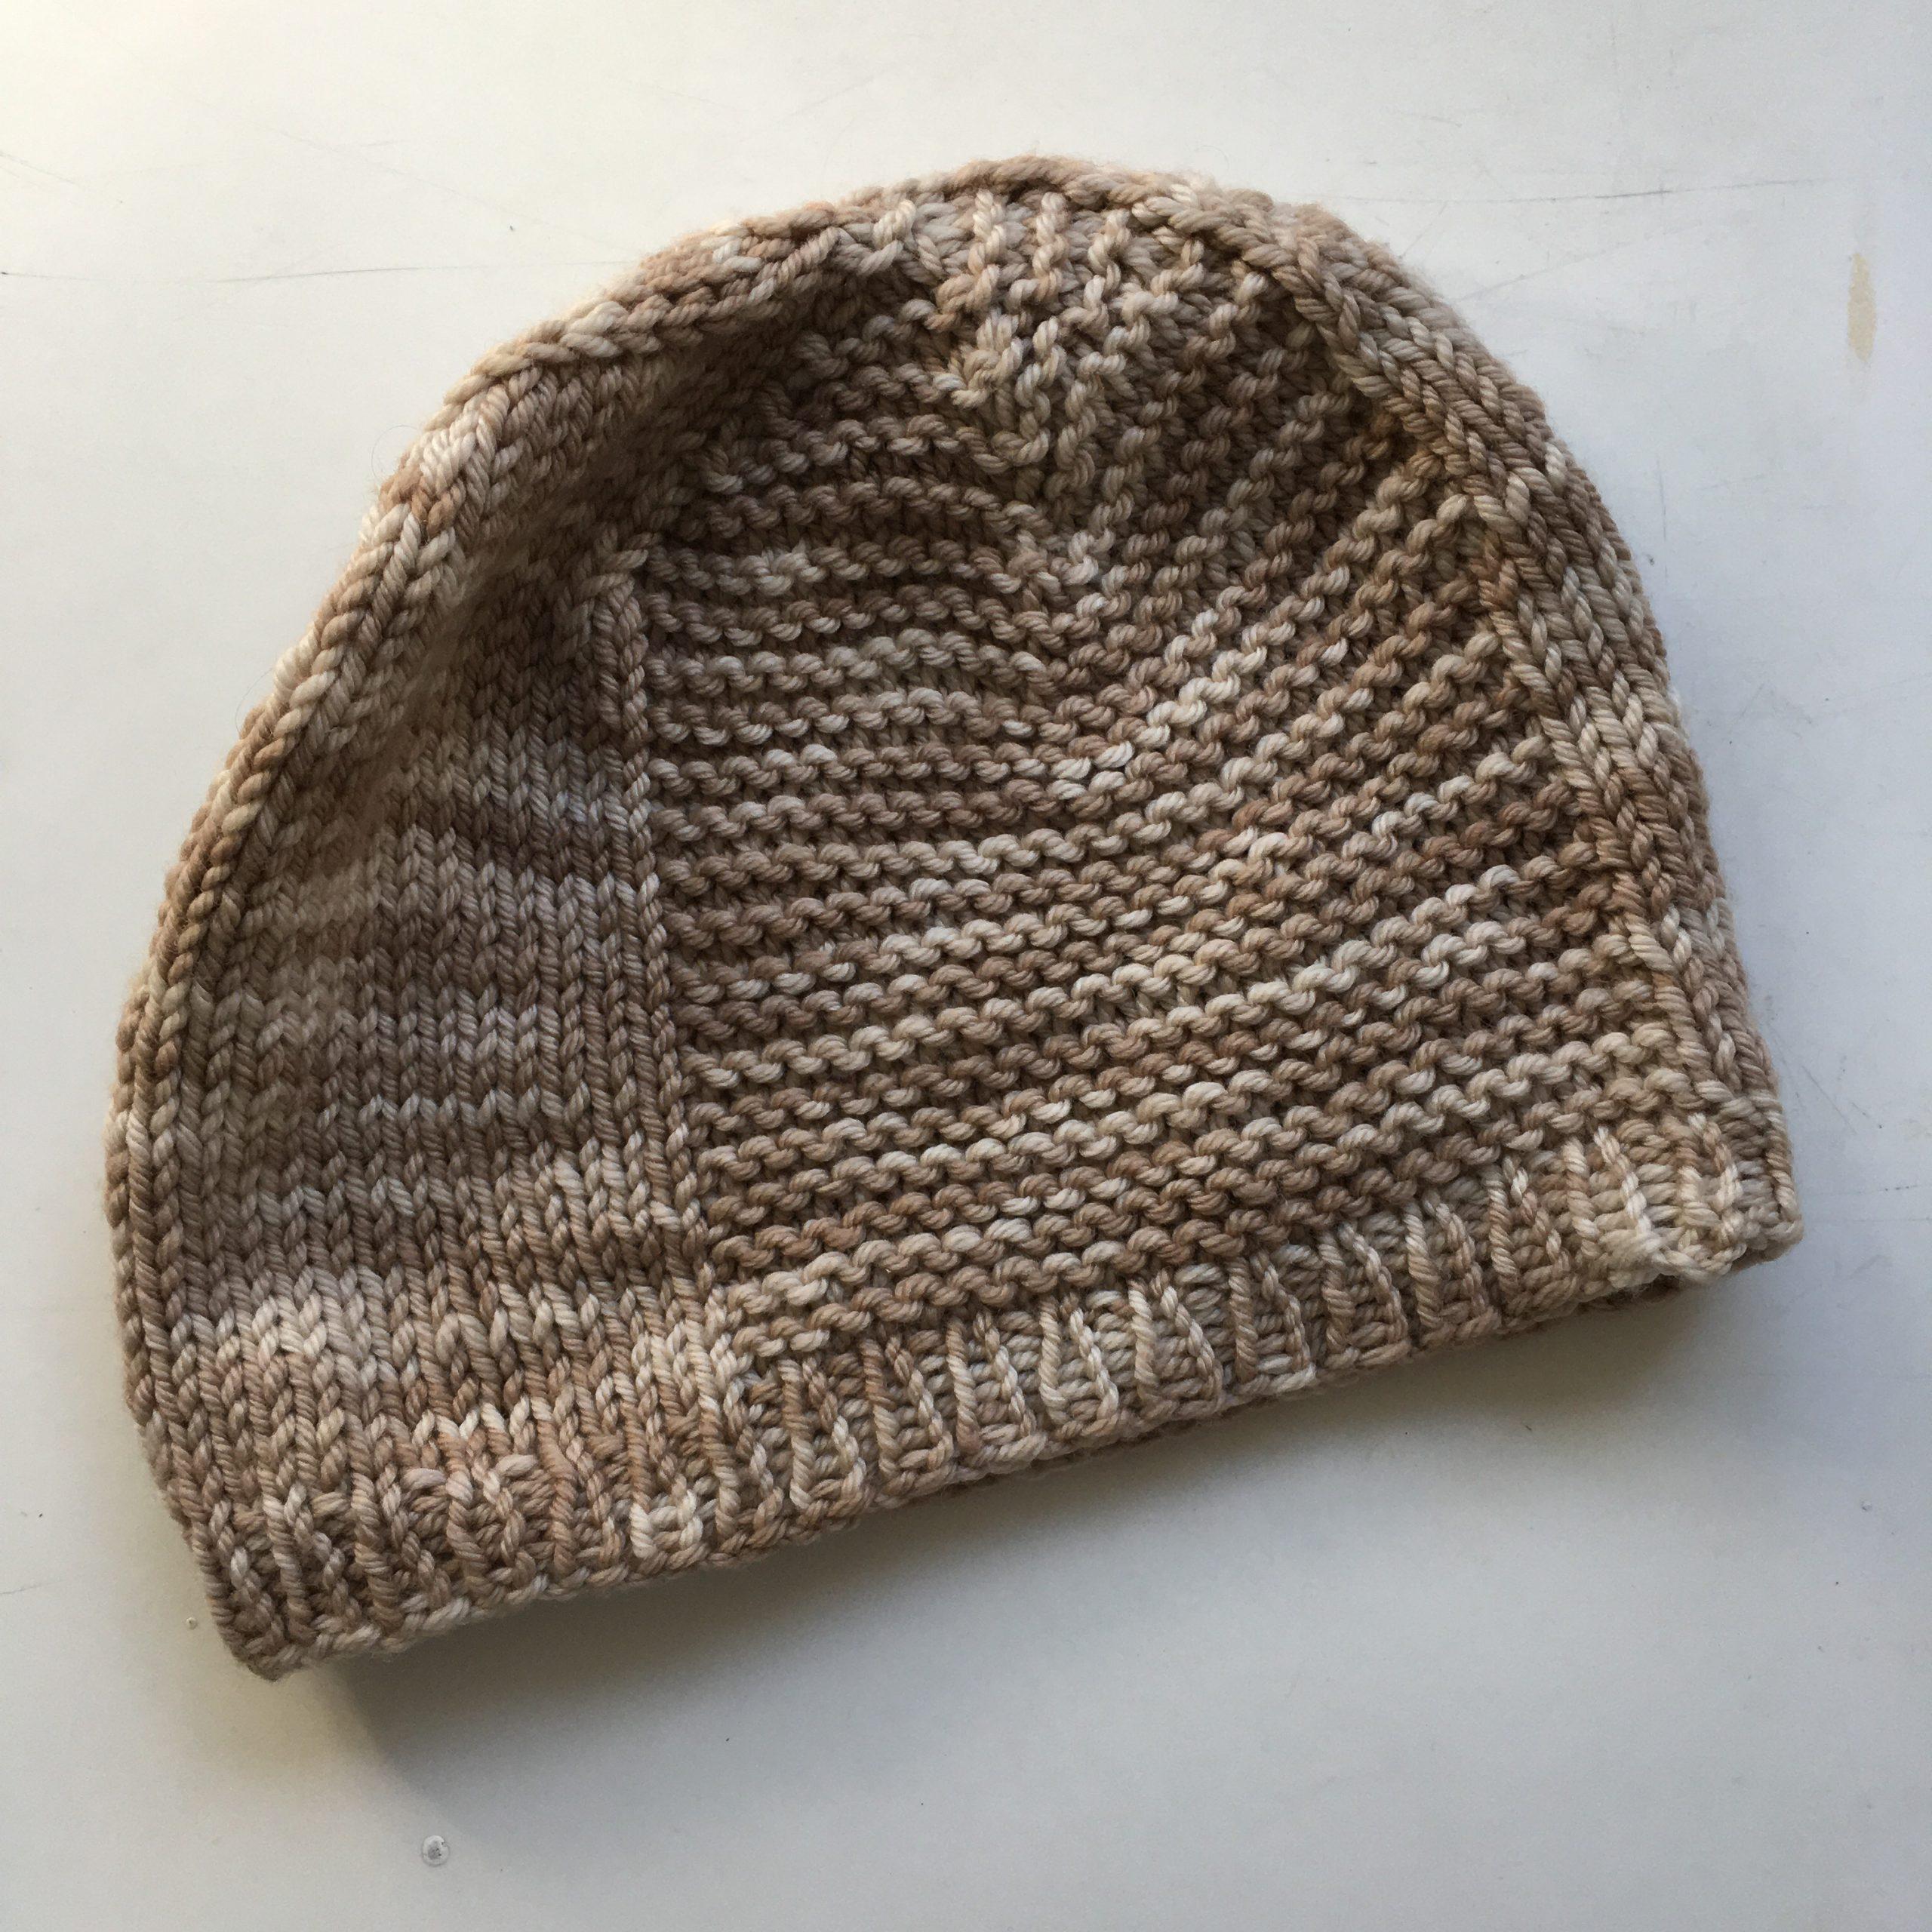 Knit Hat - Barley pattern by TinCanKnits